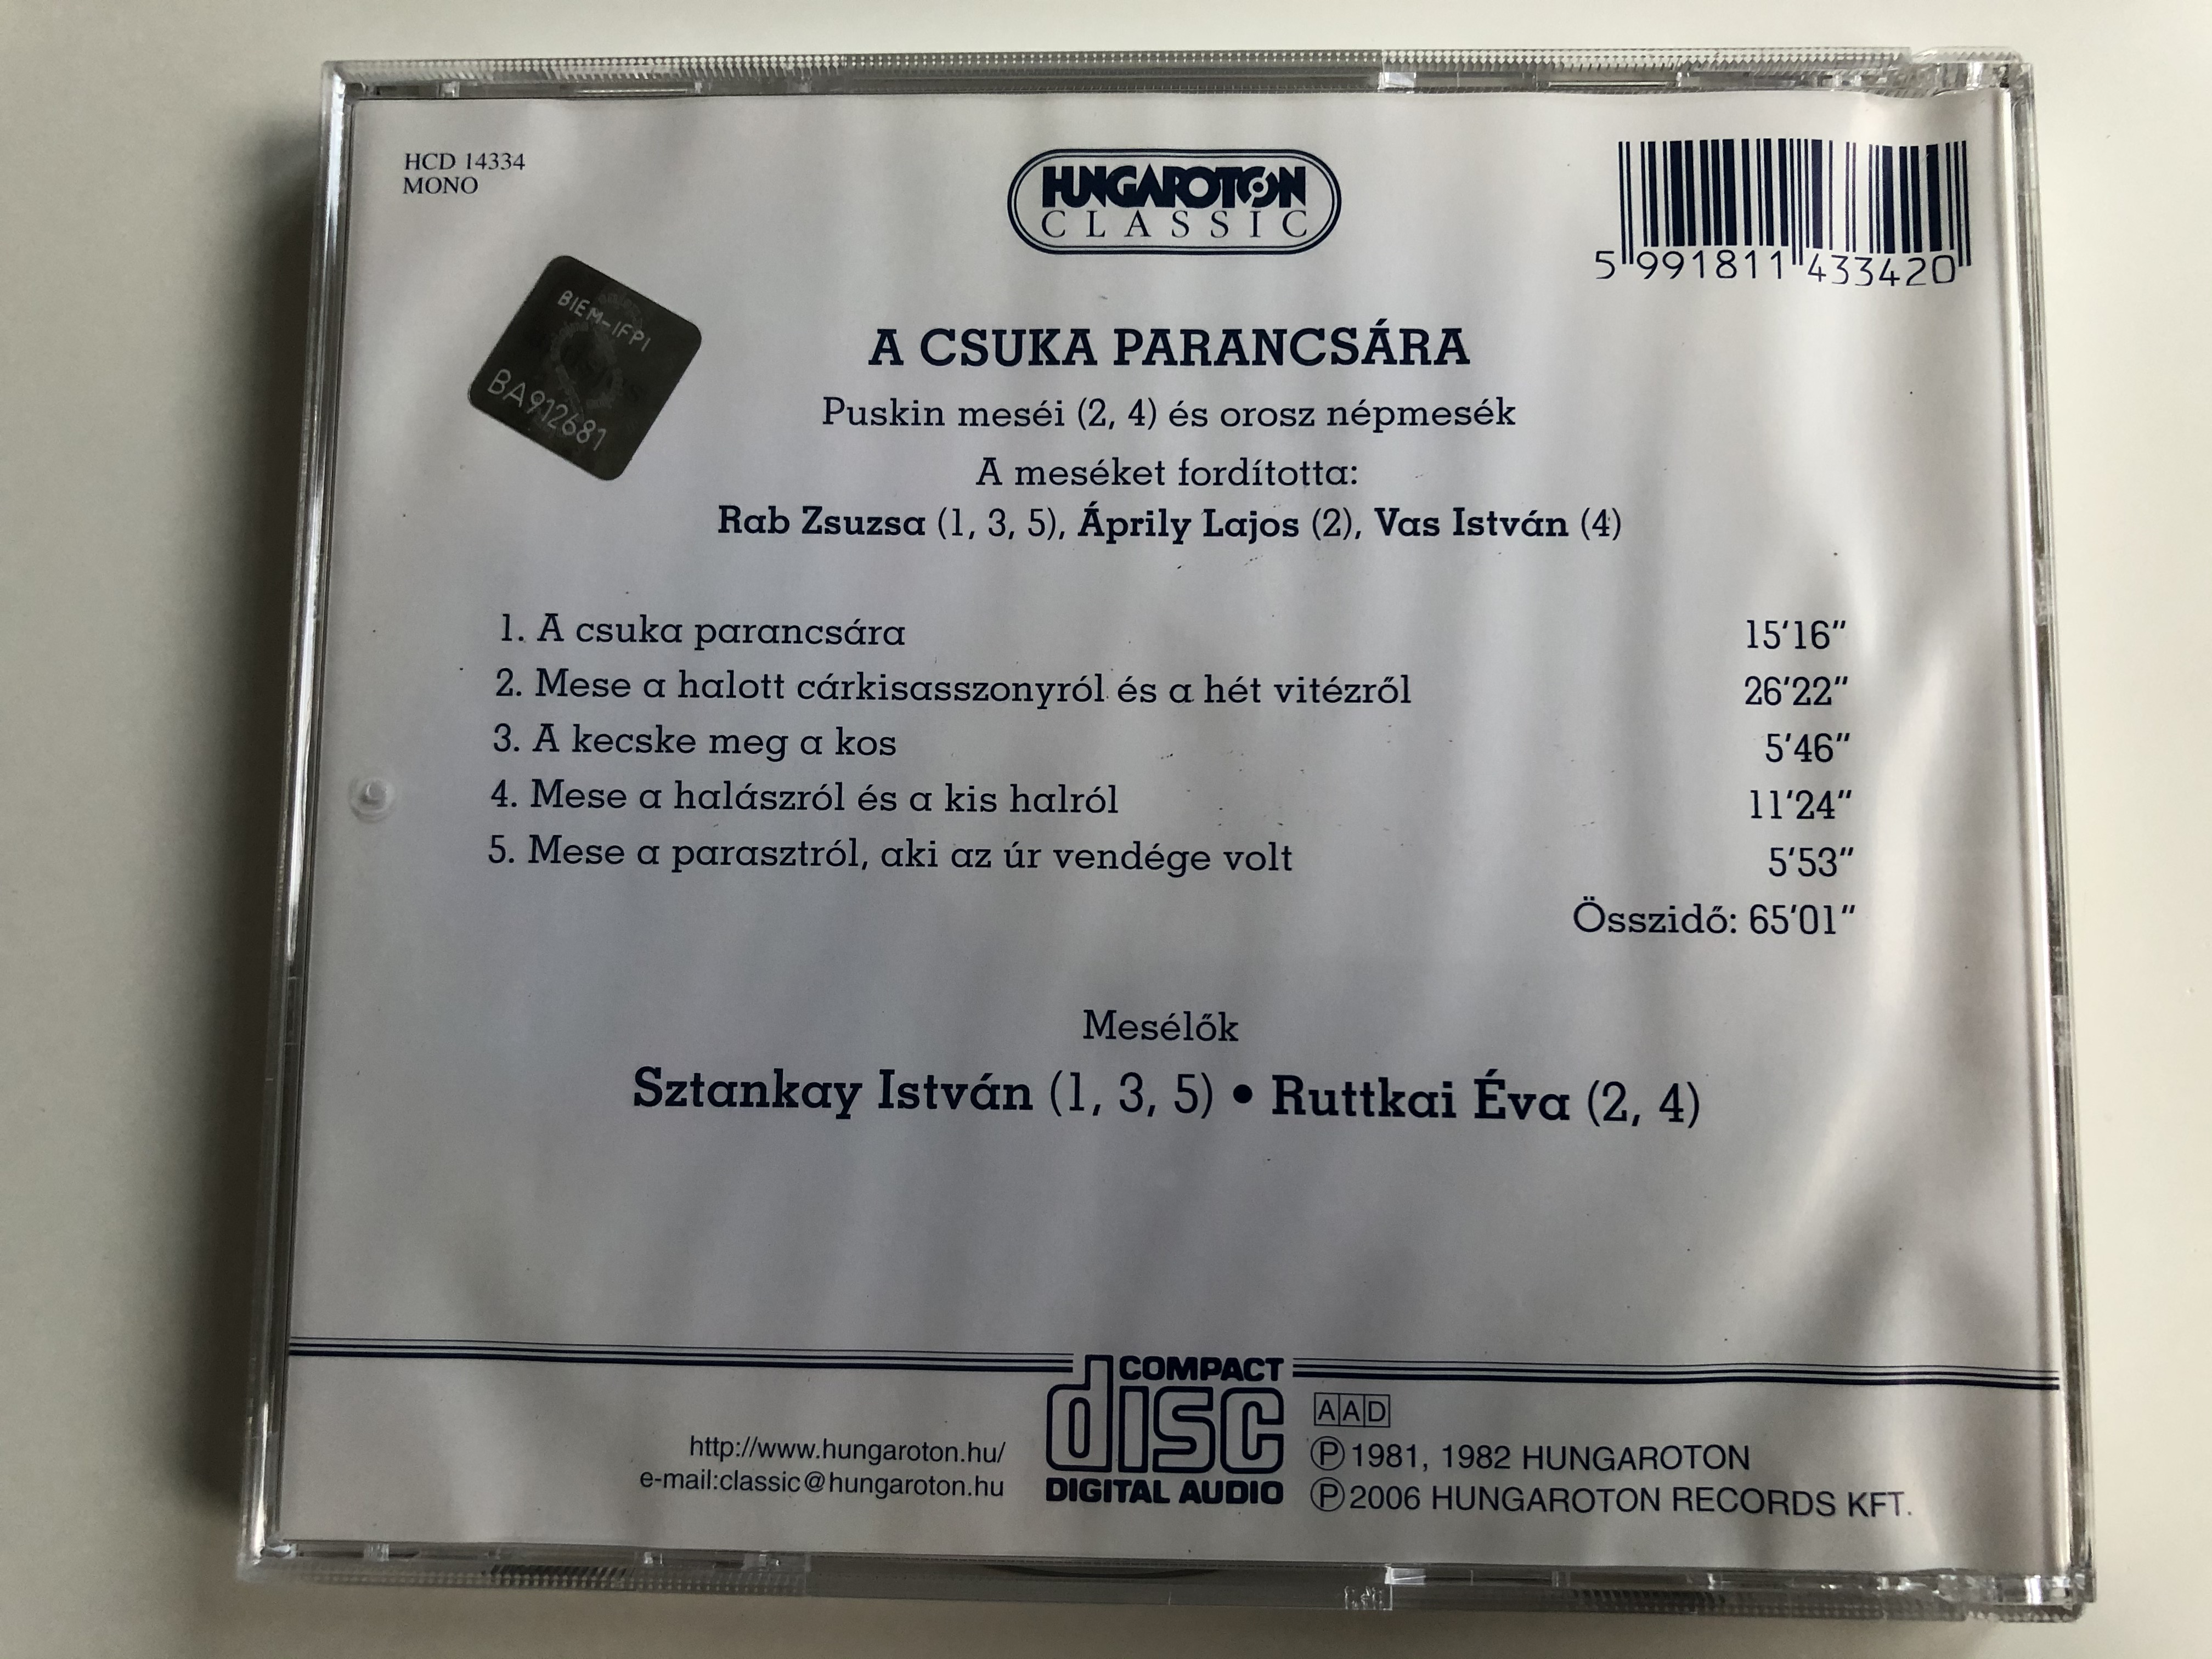 a-csuka-parancs-ra-puskin-mesei-es-orosz-n-pmes-k-sztankay-istv-n-ruttkai-eva-hungaroton-classic-audio-cd-2006-mono-hcd-14334-4-.jpg